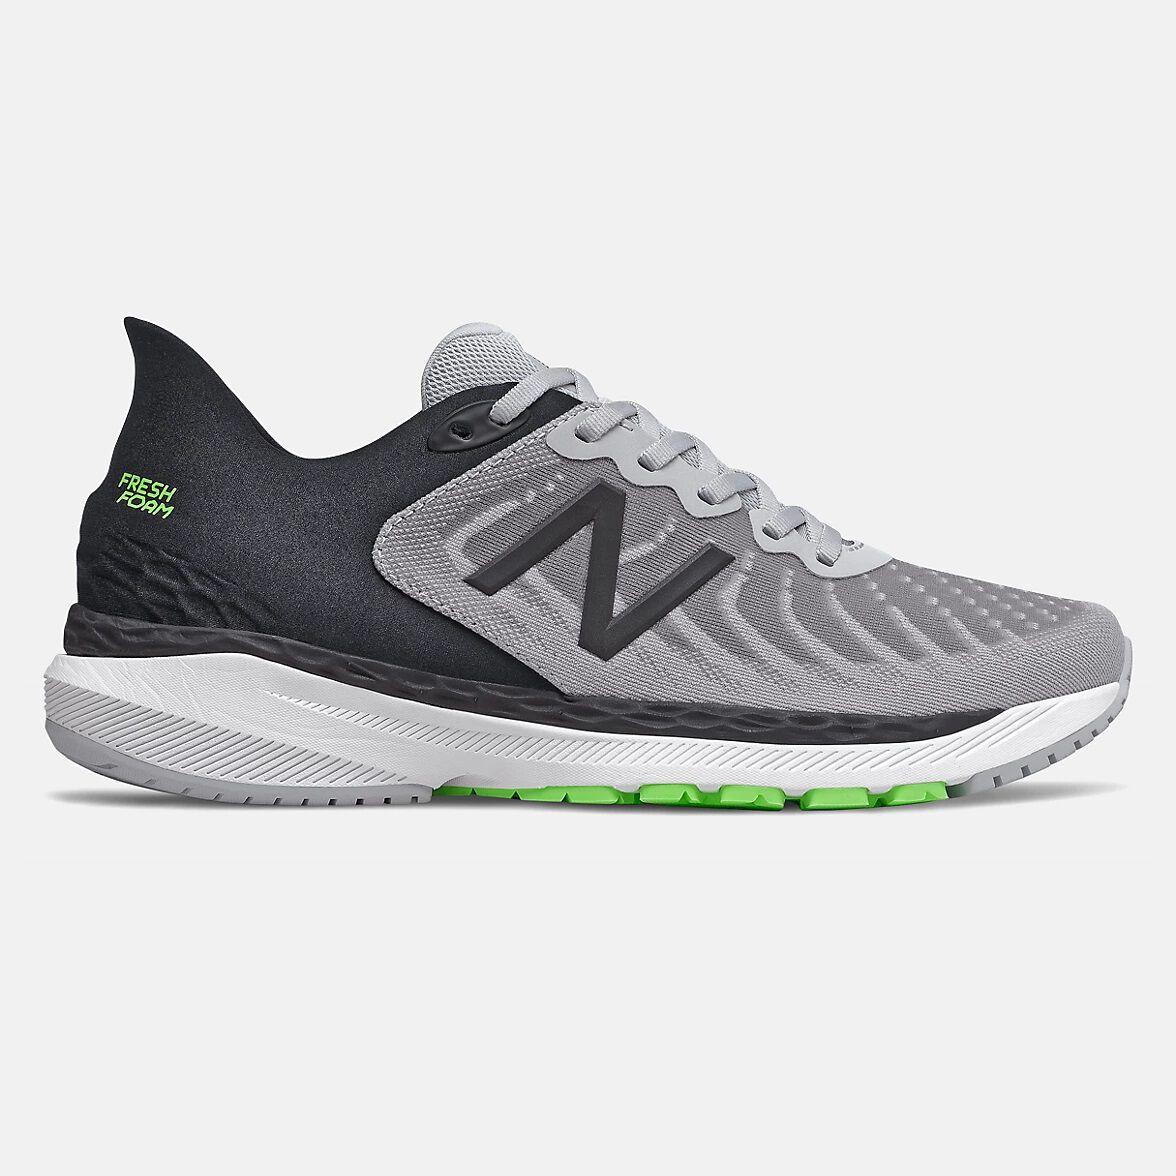 New Balance® Chaussures & Vêtements | Site Officiel - New Balance